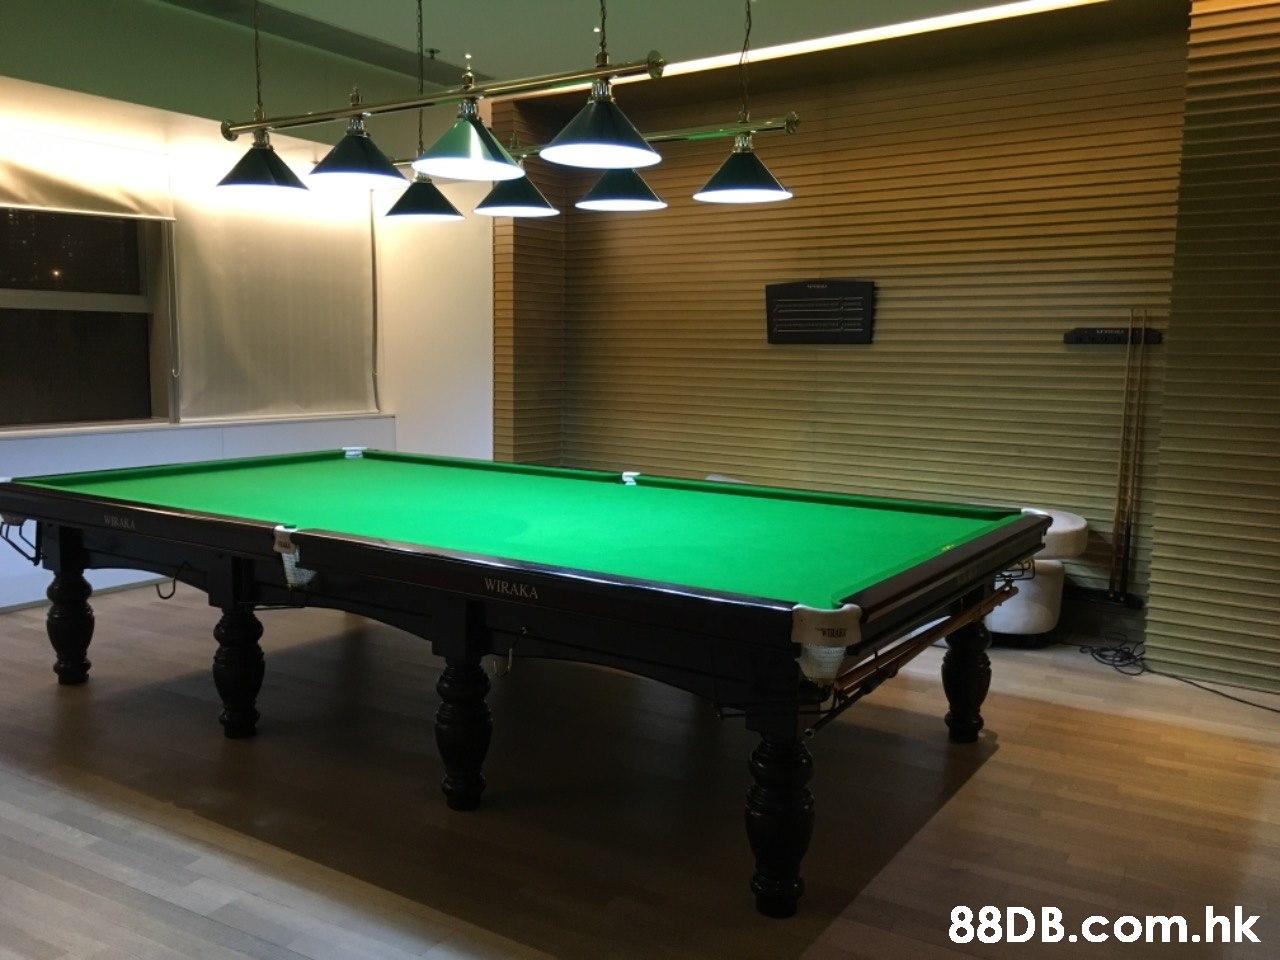 WIRAKA .hk  Billiard room,Billiards,Billiard table,Indoor games and sports,Pool